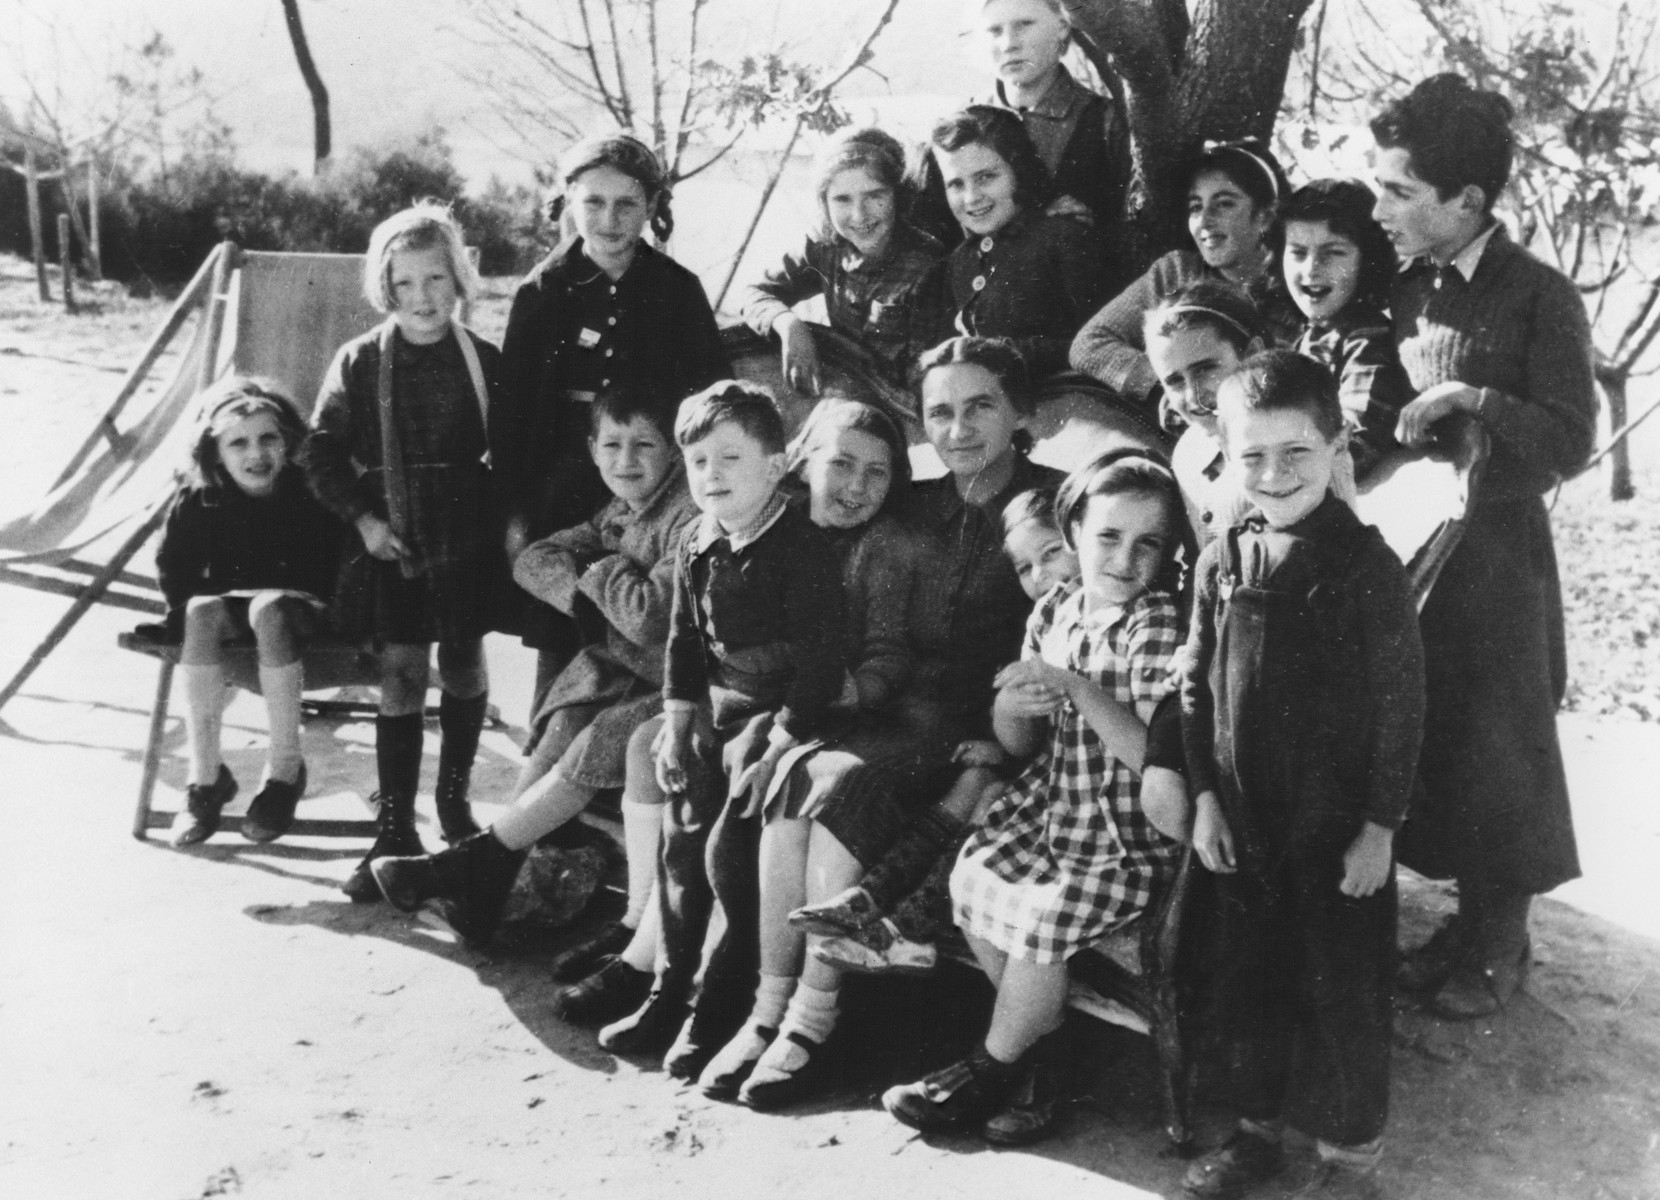 Group portrait of children hiding in the MACE (Maison d'Accueil Chretienne pour Enfants) home in Vence.  Those pictured include Marek Adamel, Judith Sachs, Martha Levai, Helene Steinmetz, Gertrude Reisz, and Alice Waldman, Celine Sachs.